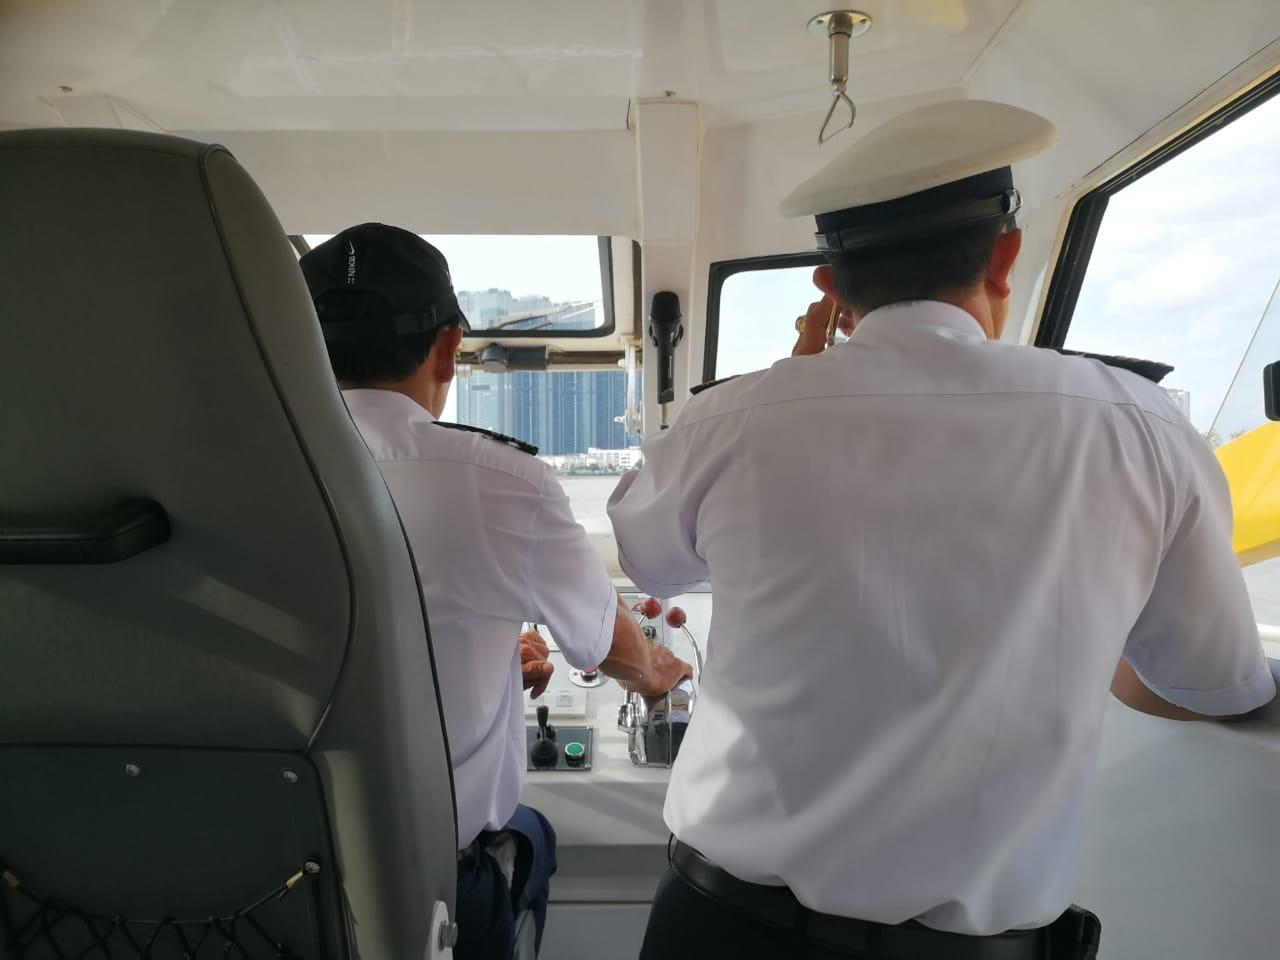 Crew members of the Saigon water bus comandeer the boat.